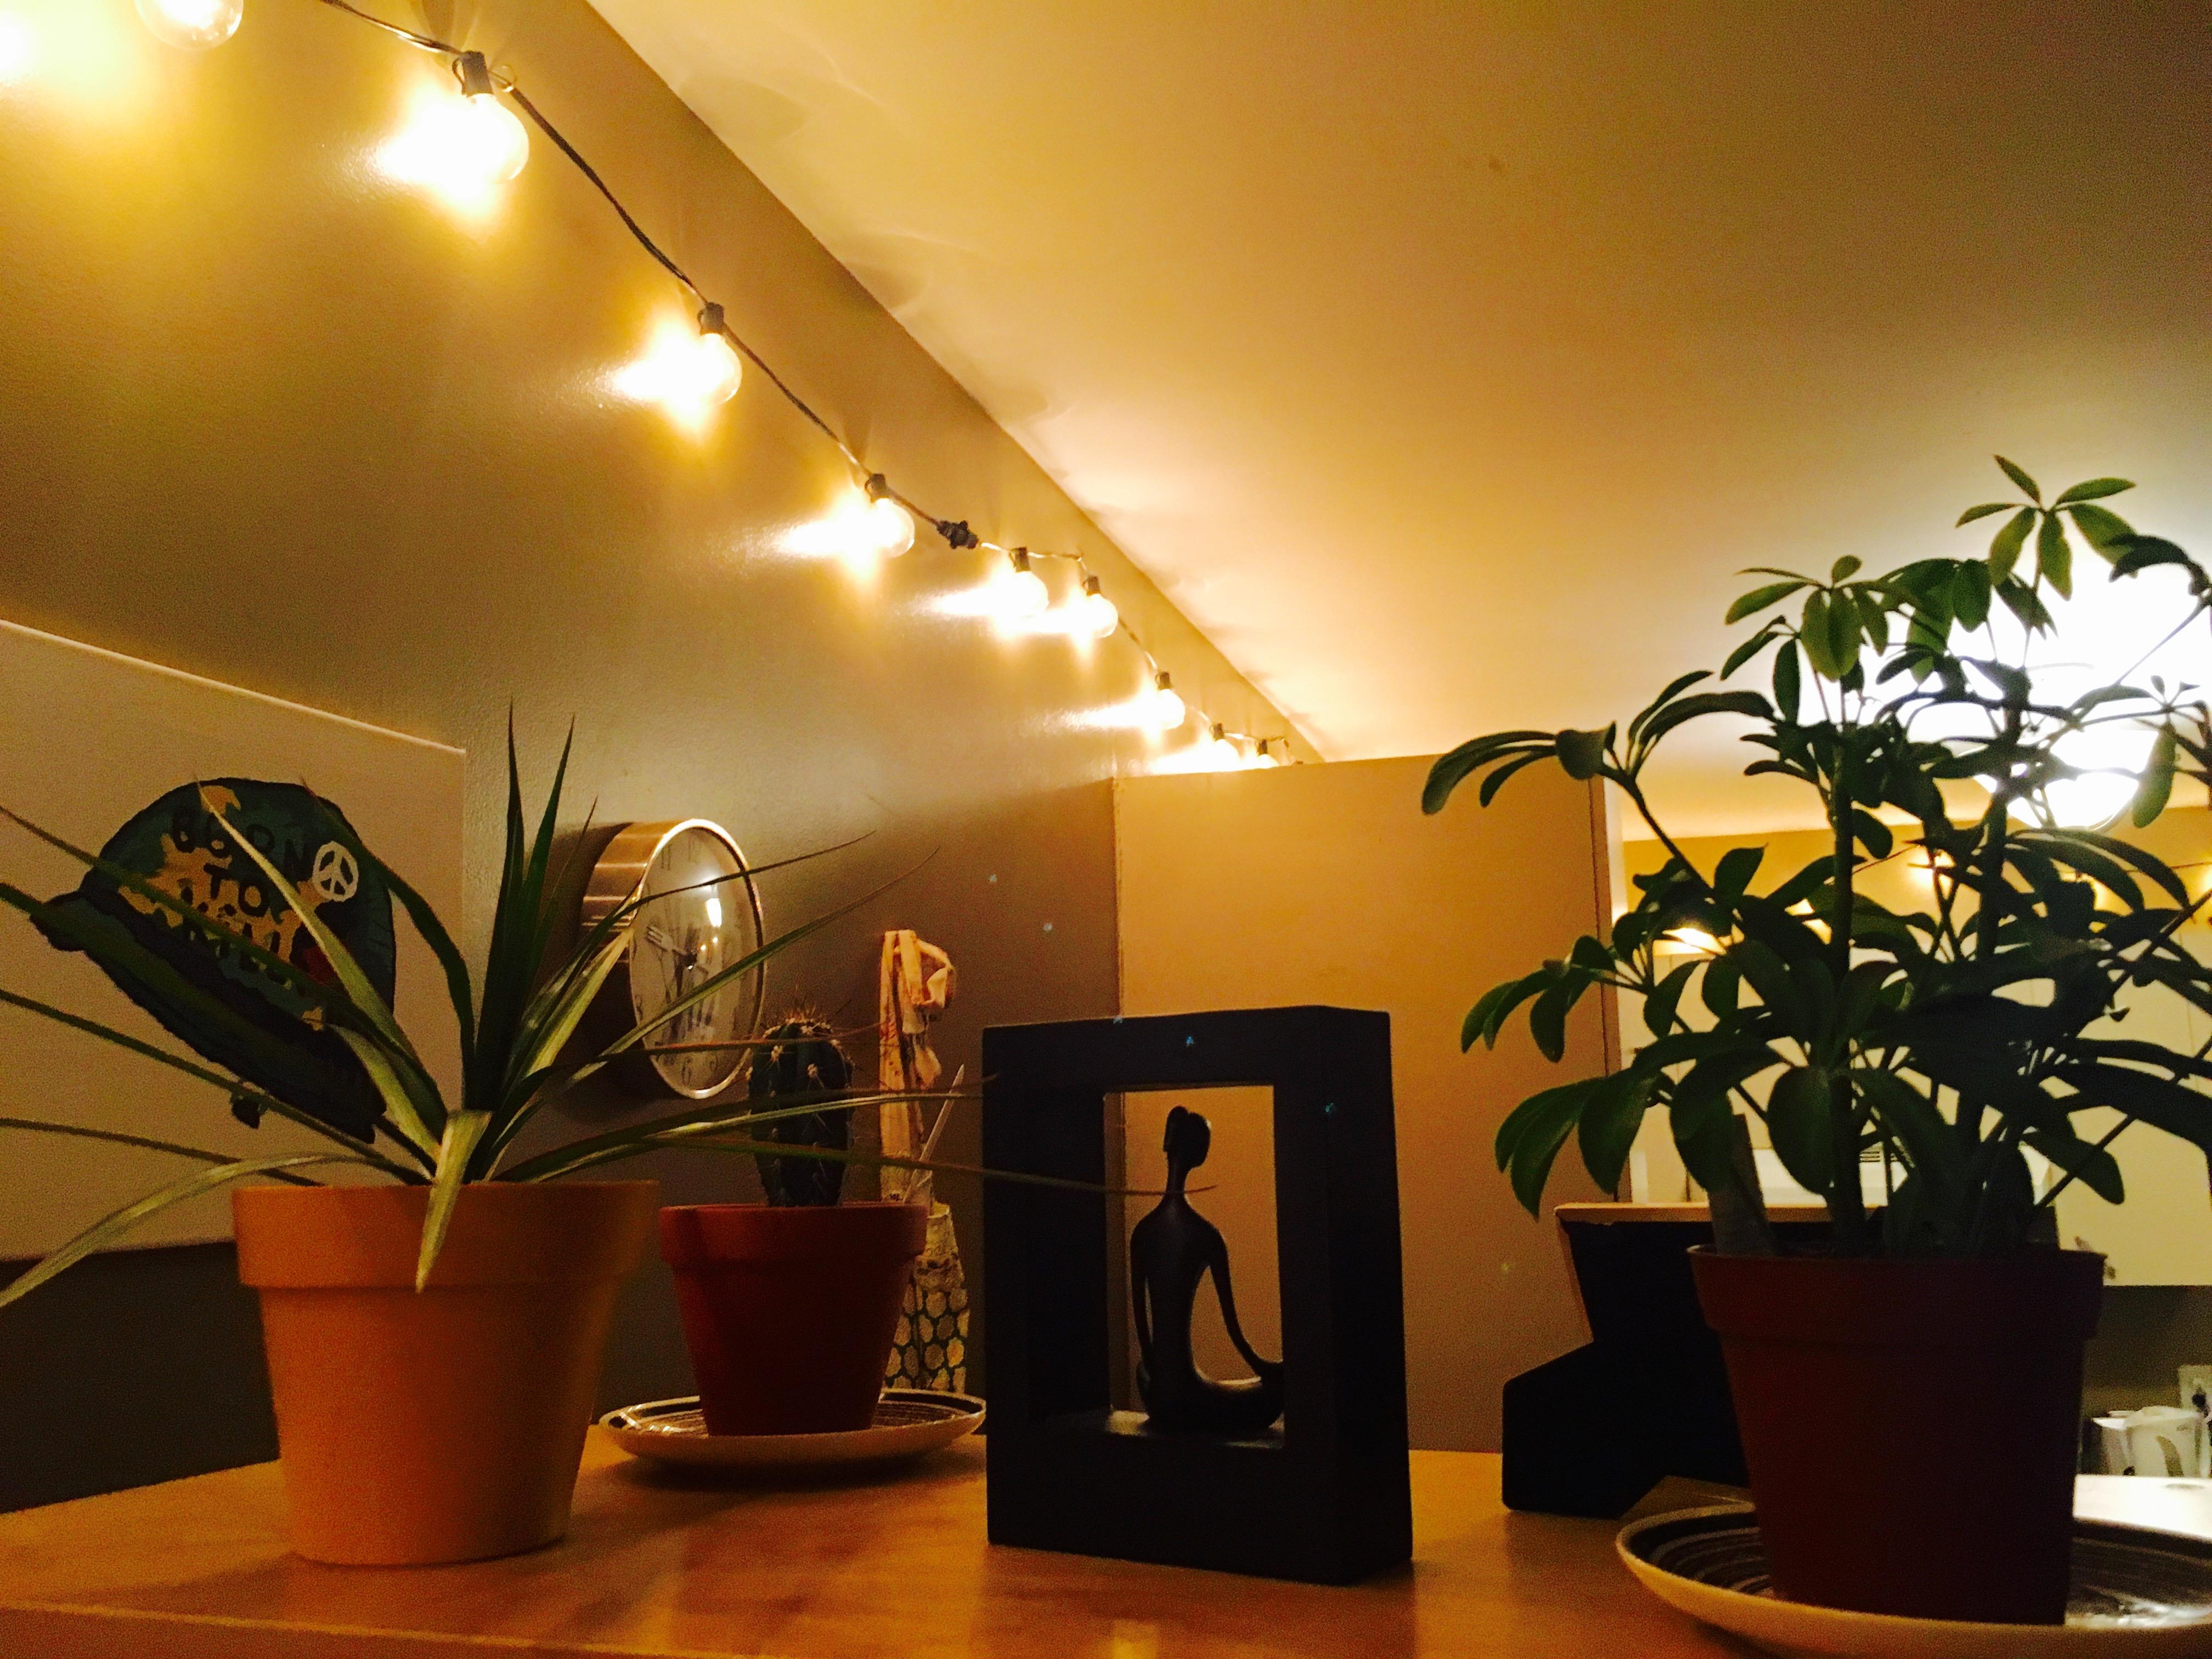 String lights hanging along living room walls